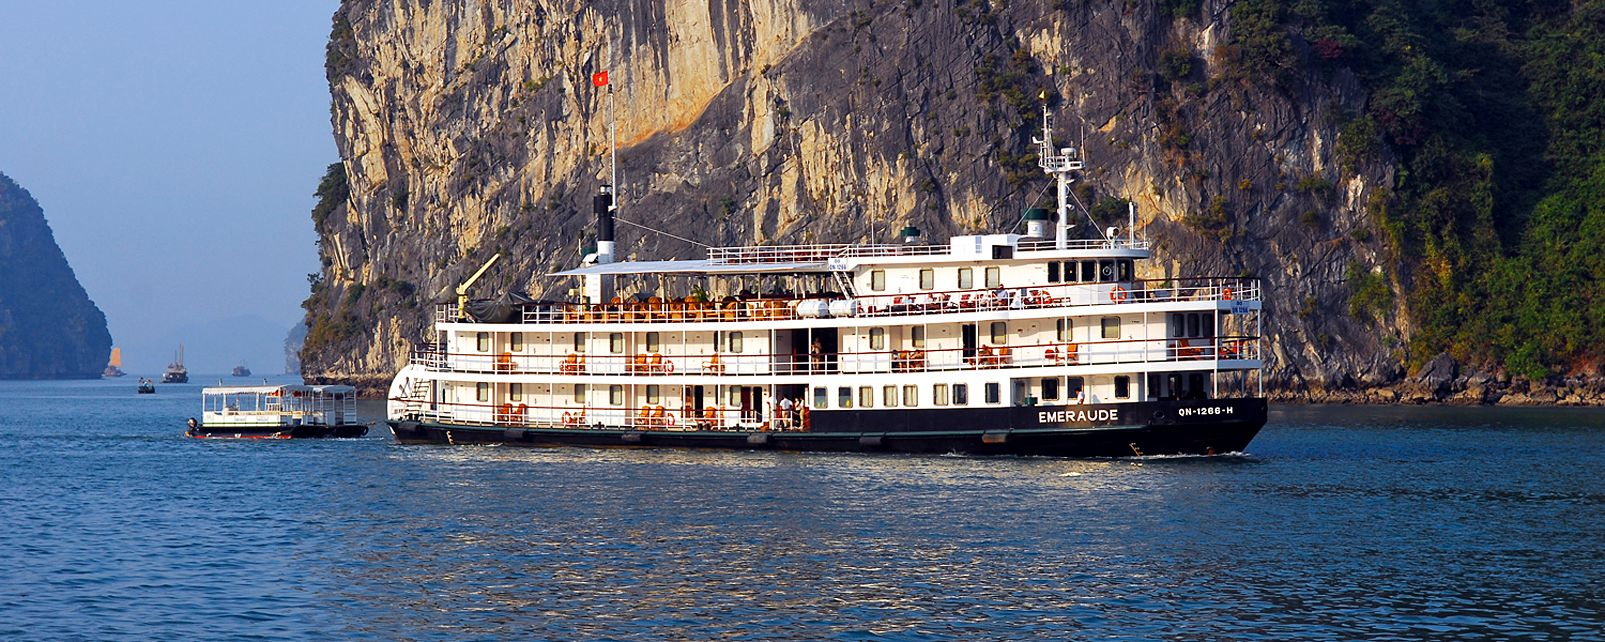 Hôtel Emeraude bateau